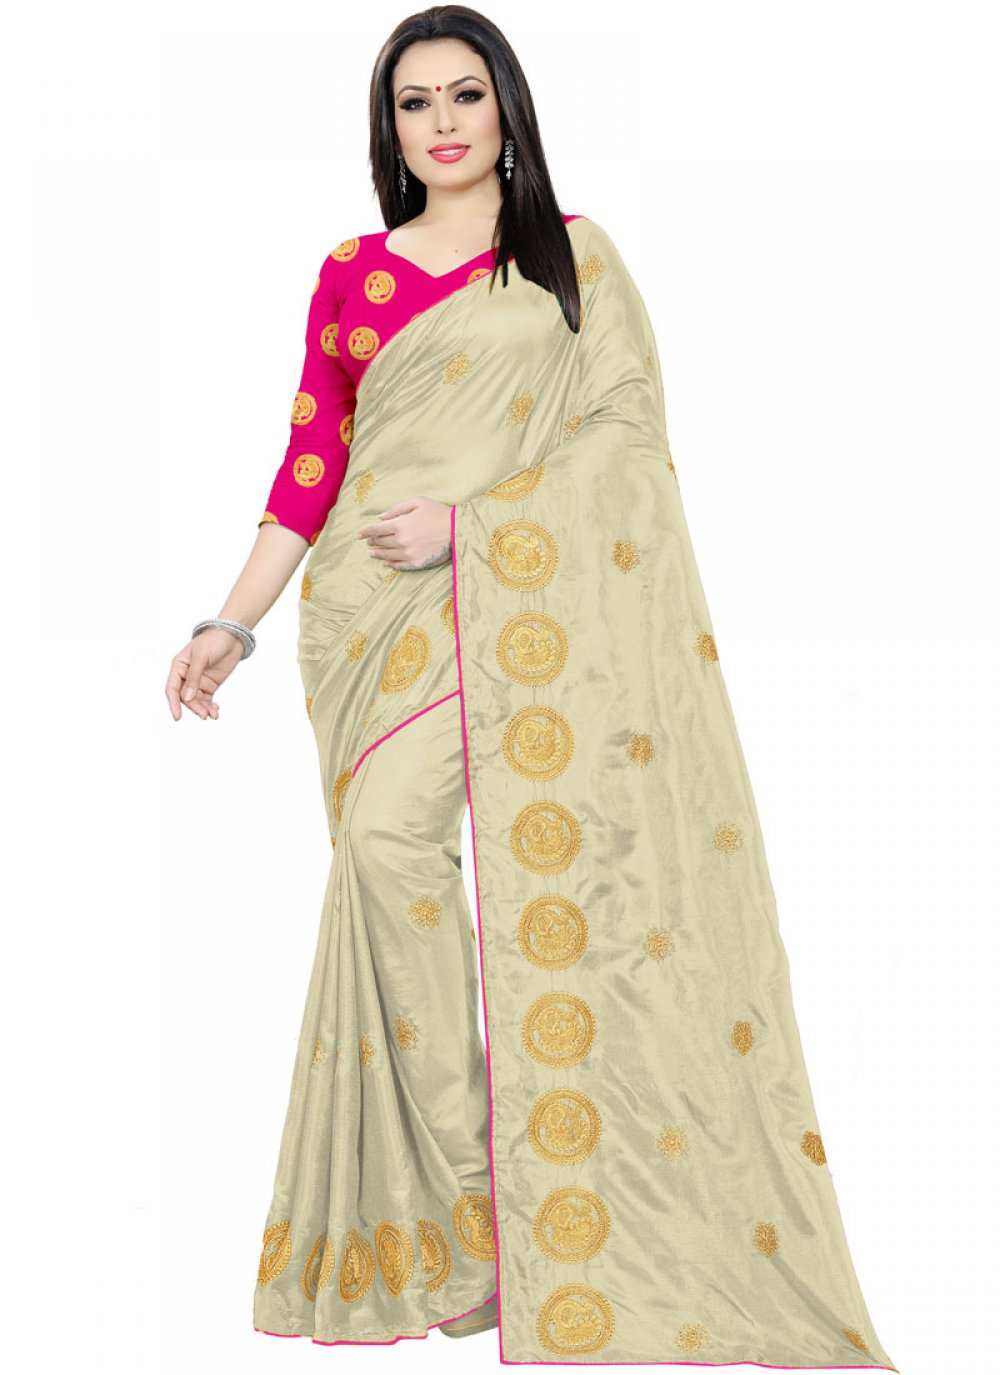 Embroidered Beige Trendy Saree